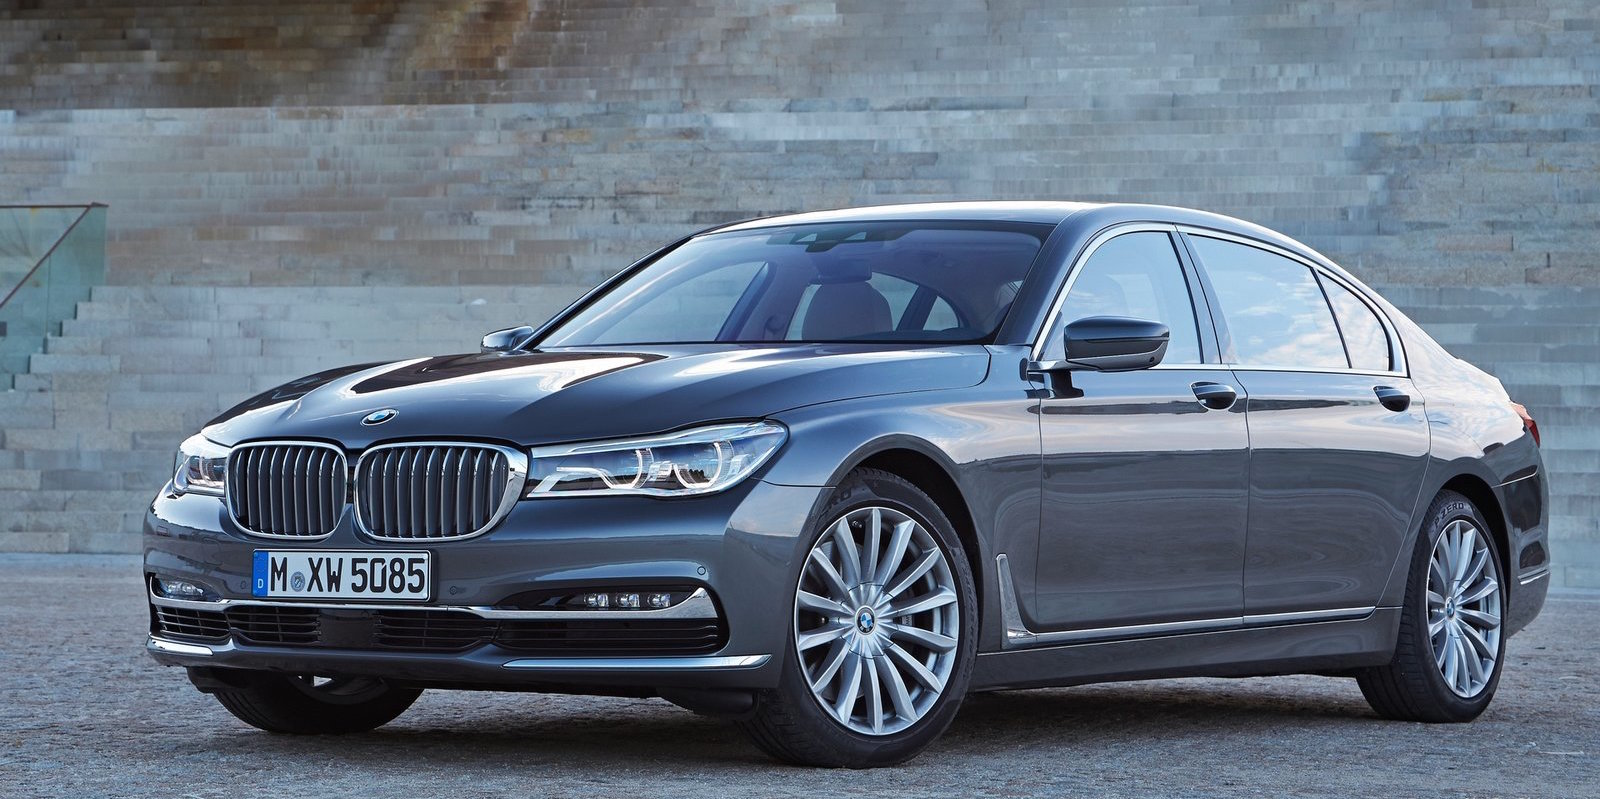 Bmw X4 2018 >> 2016 BMW New Cars - photos | CarAdvice